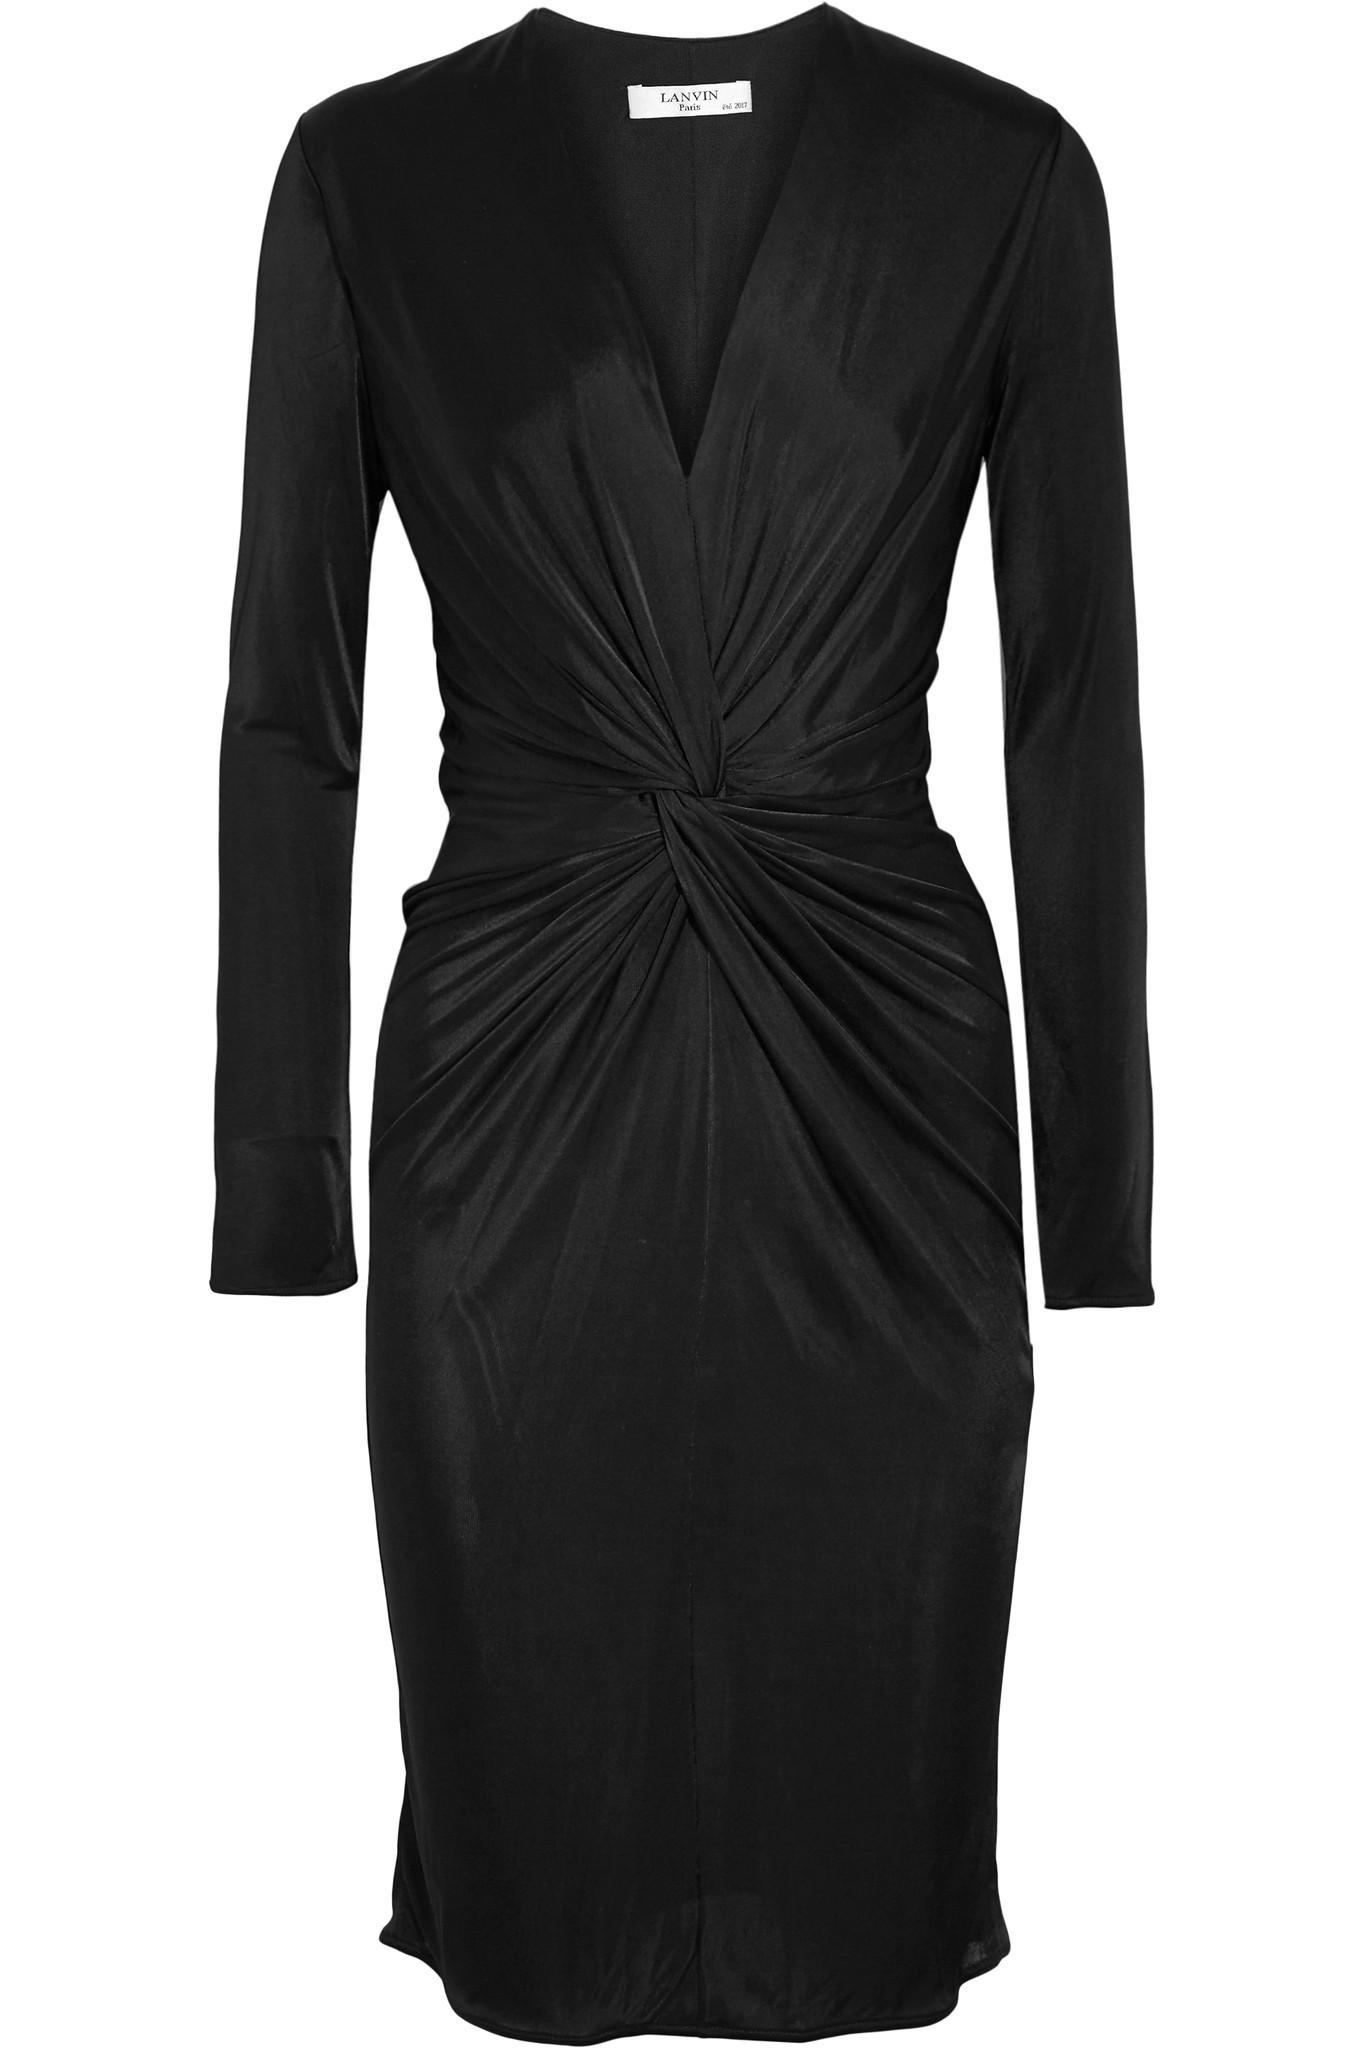 Lanvin Woman Twist-front Jersey Dress Black Size 42 Lanvin IaNZIMp